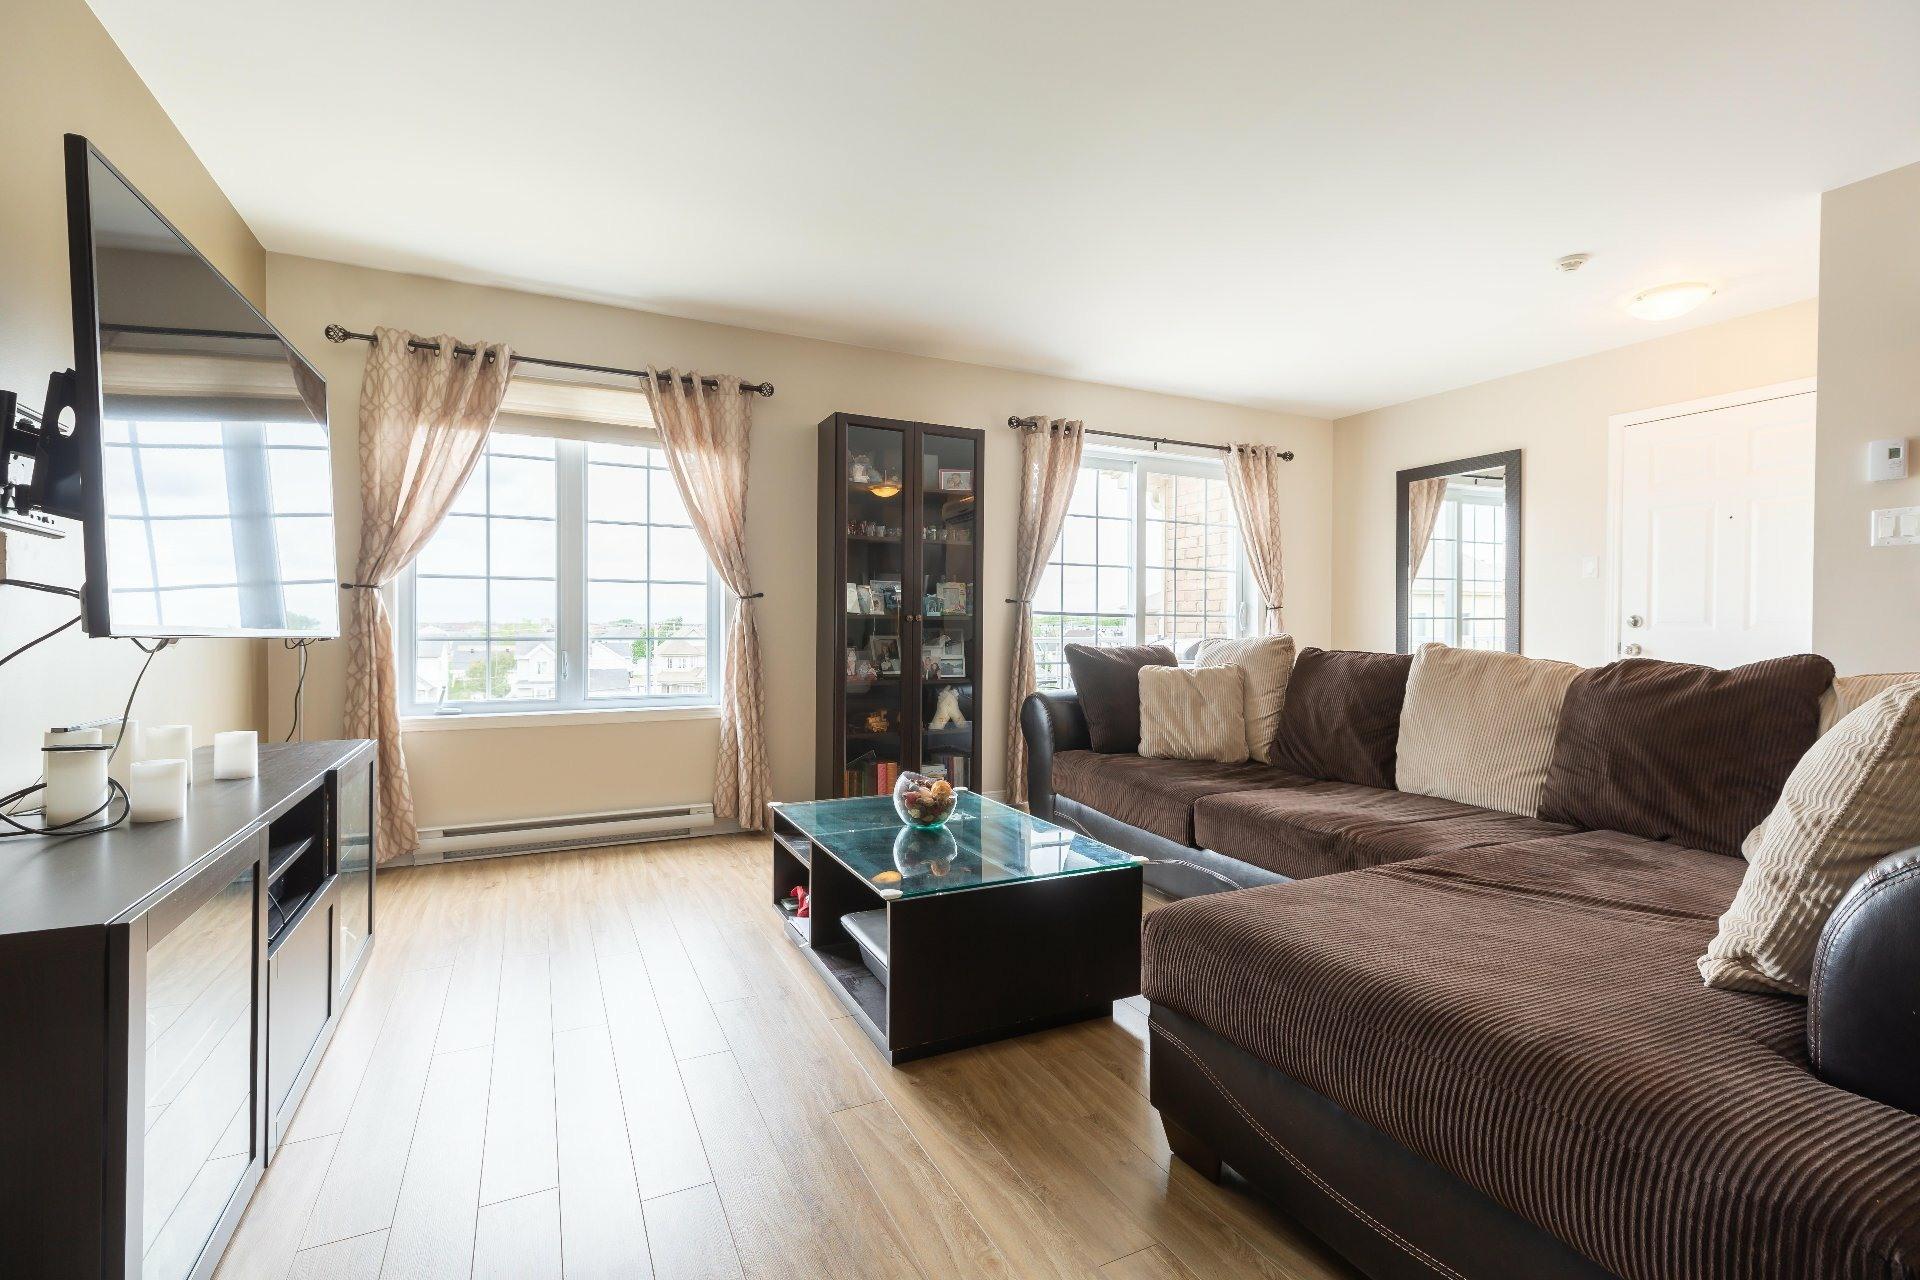 image 4 - Apartment For sale Vaudreuil-Dorion - 9 rooms